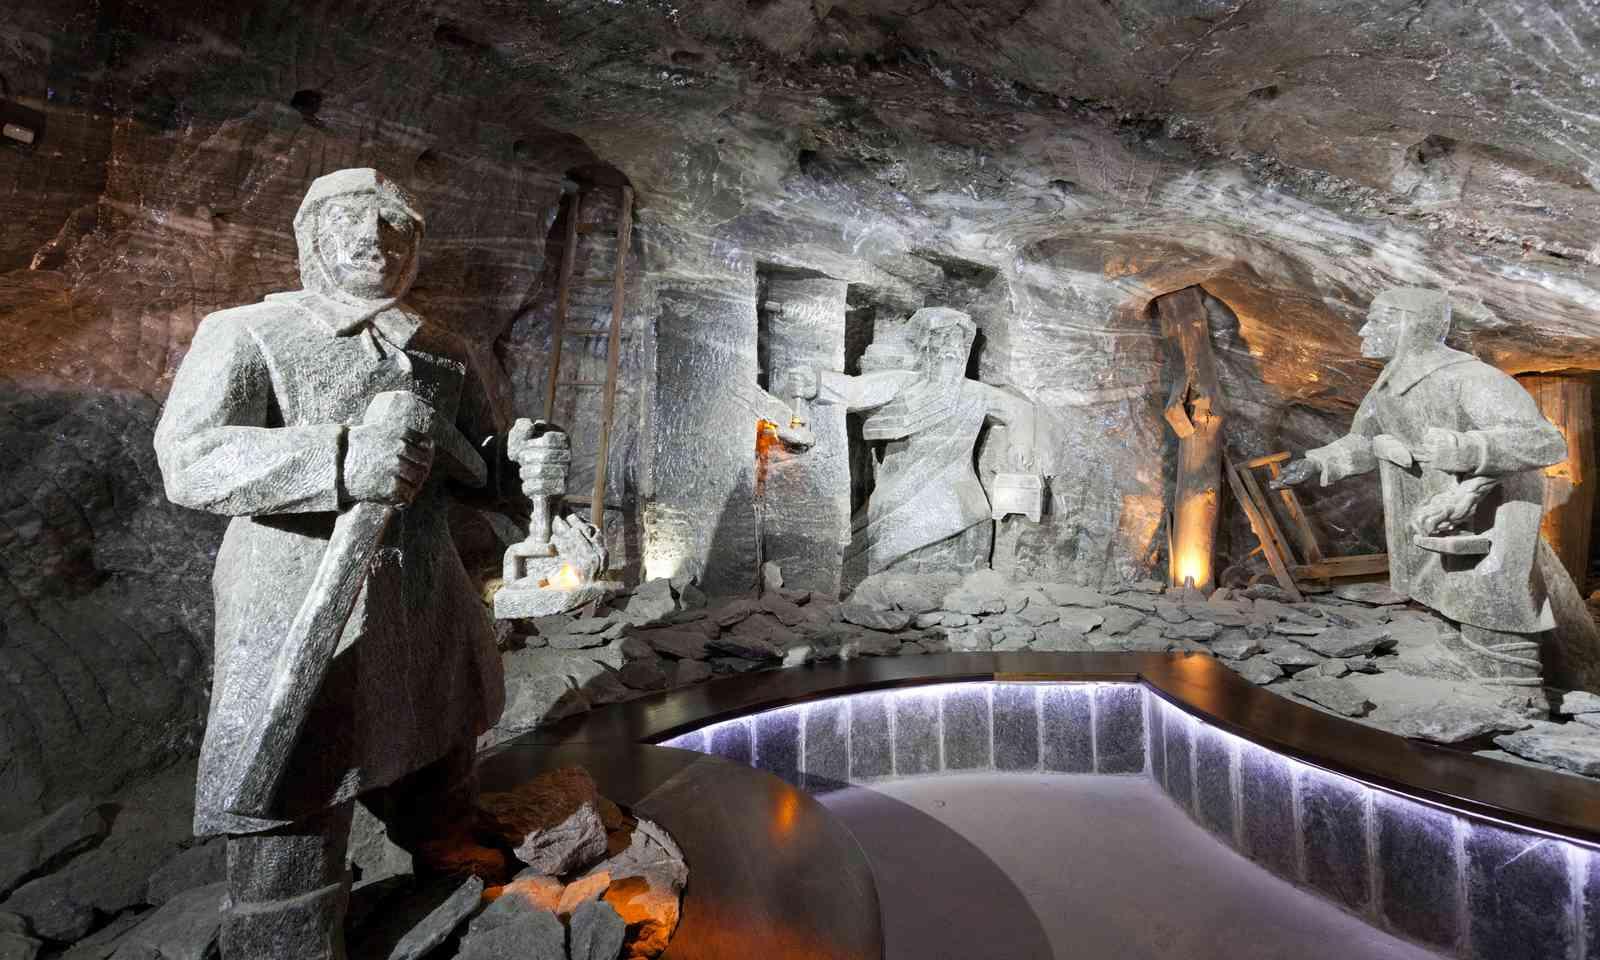 Workers carved from salt in Wieliczka (Dreamstime)